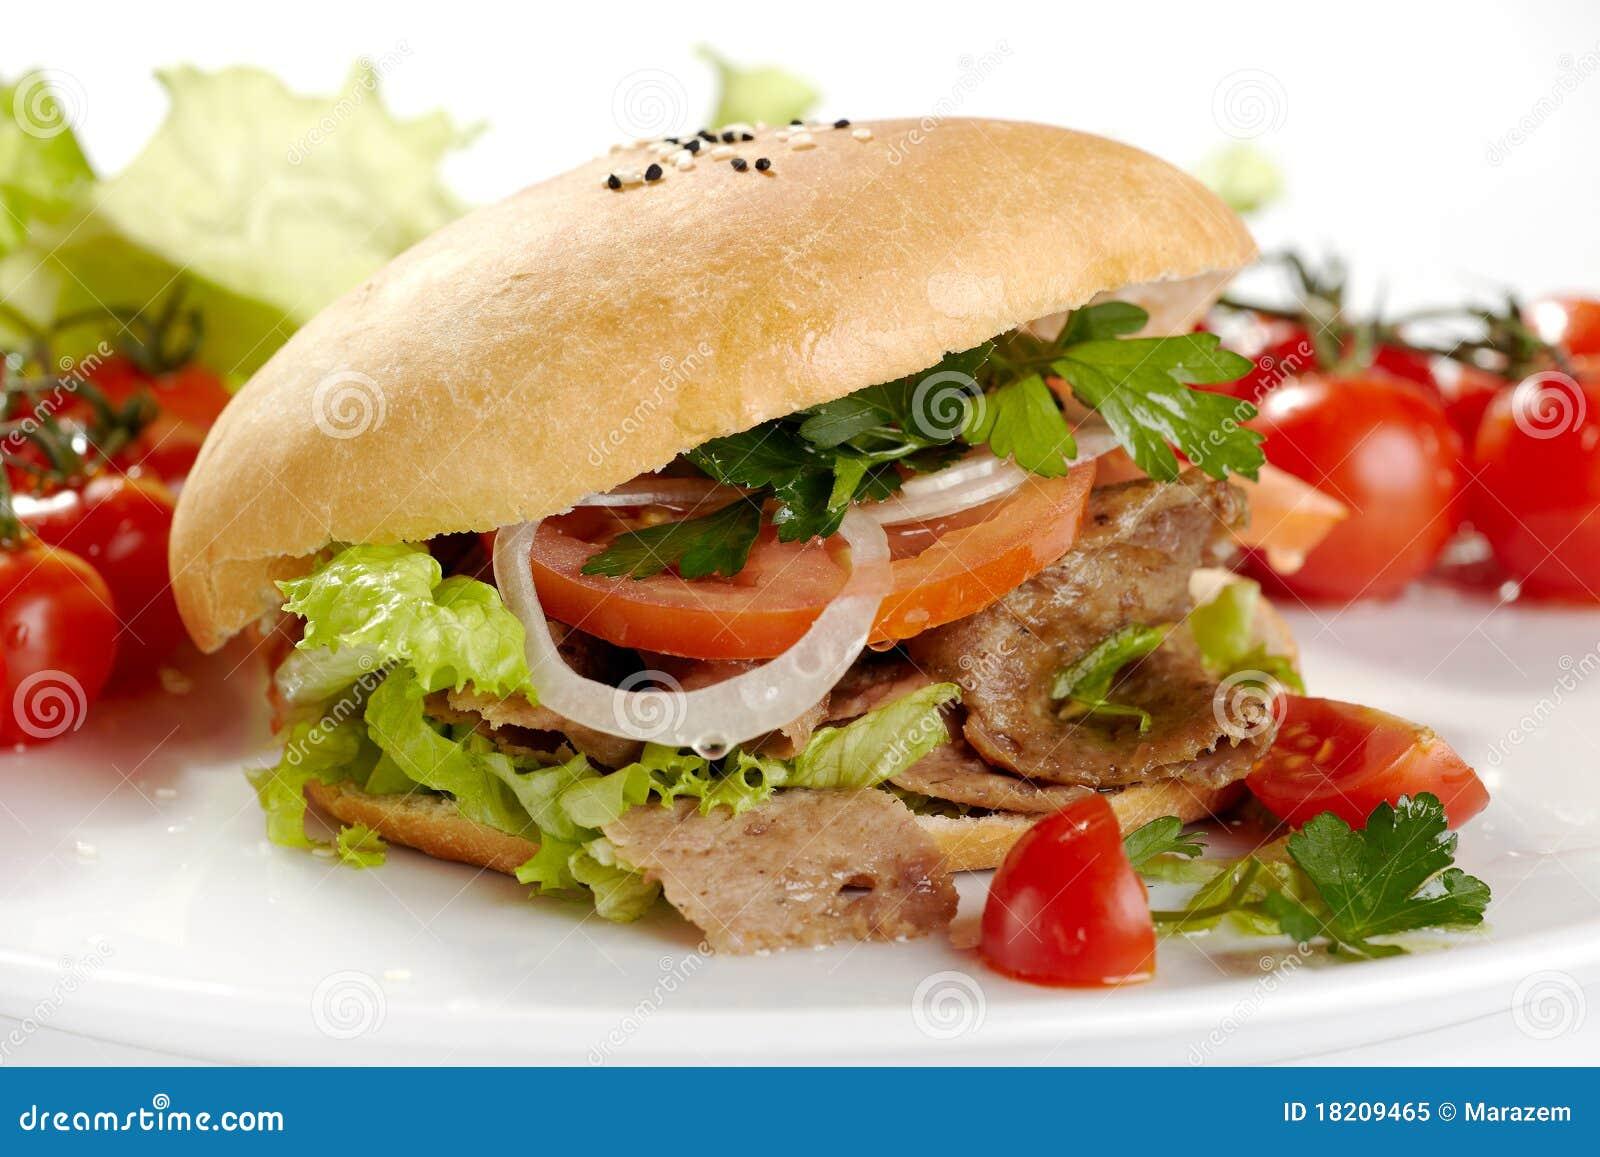 how to make doner kebab bread